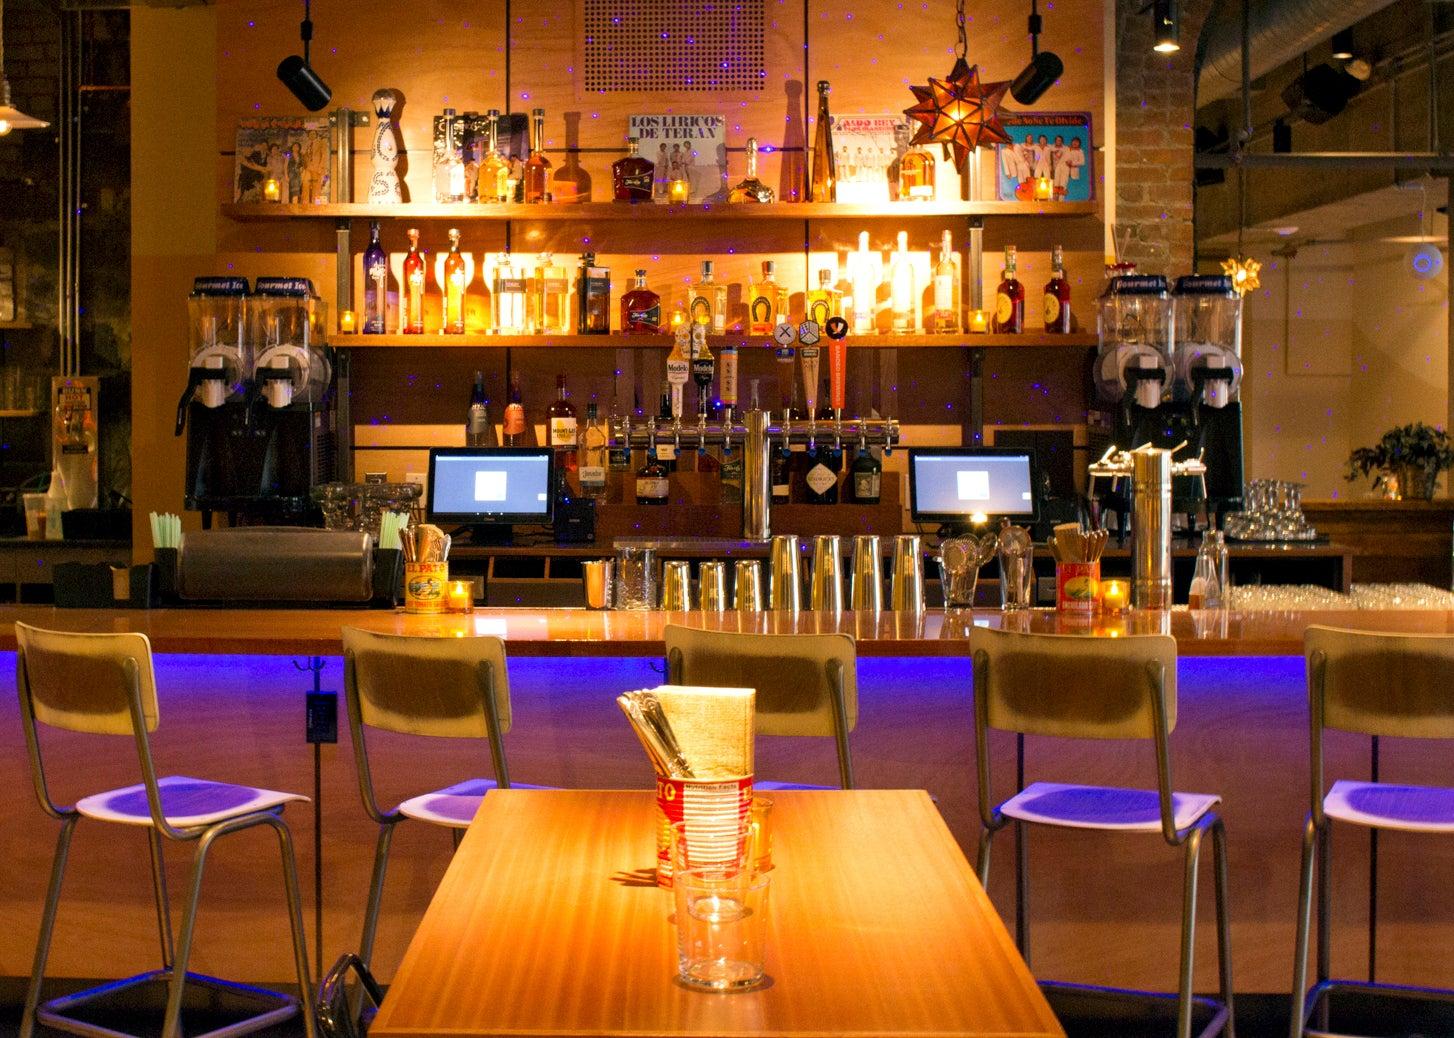 The bar at Cósmica